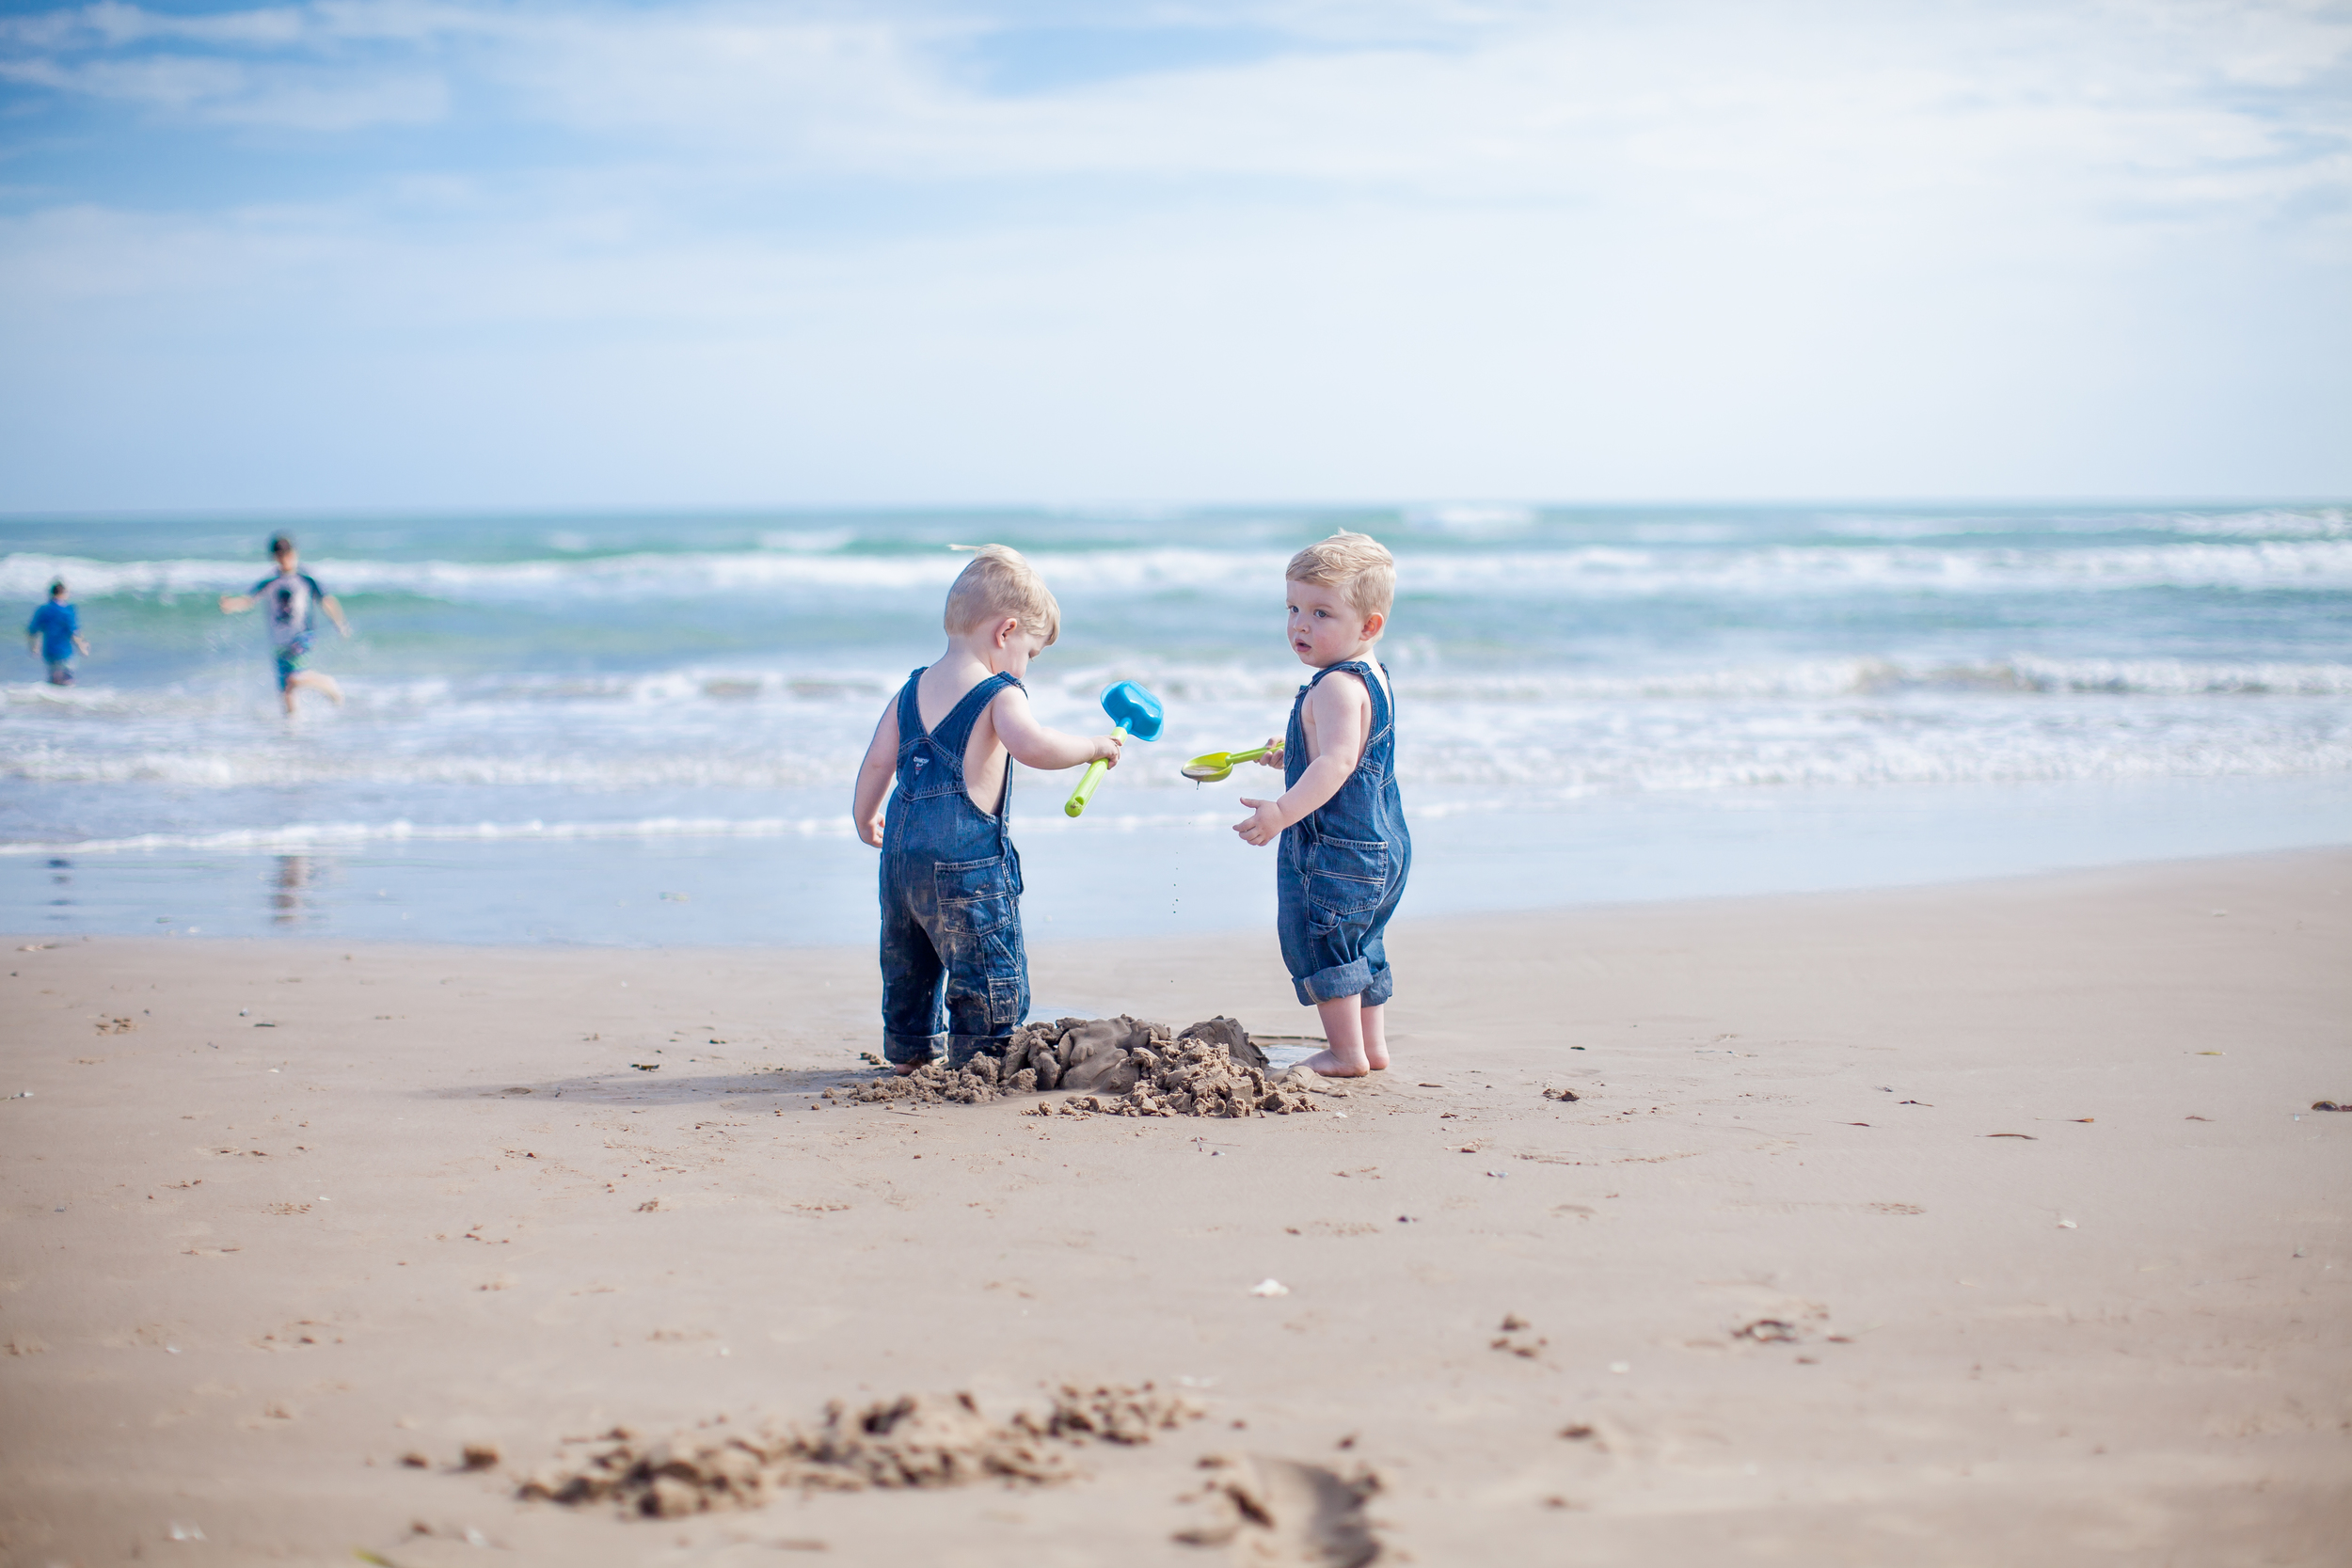 BeachBoys-001.jpg